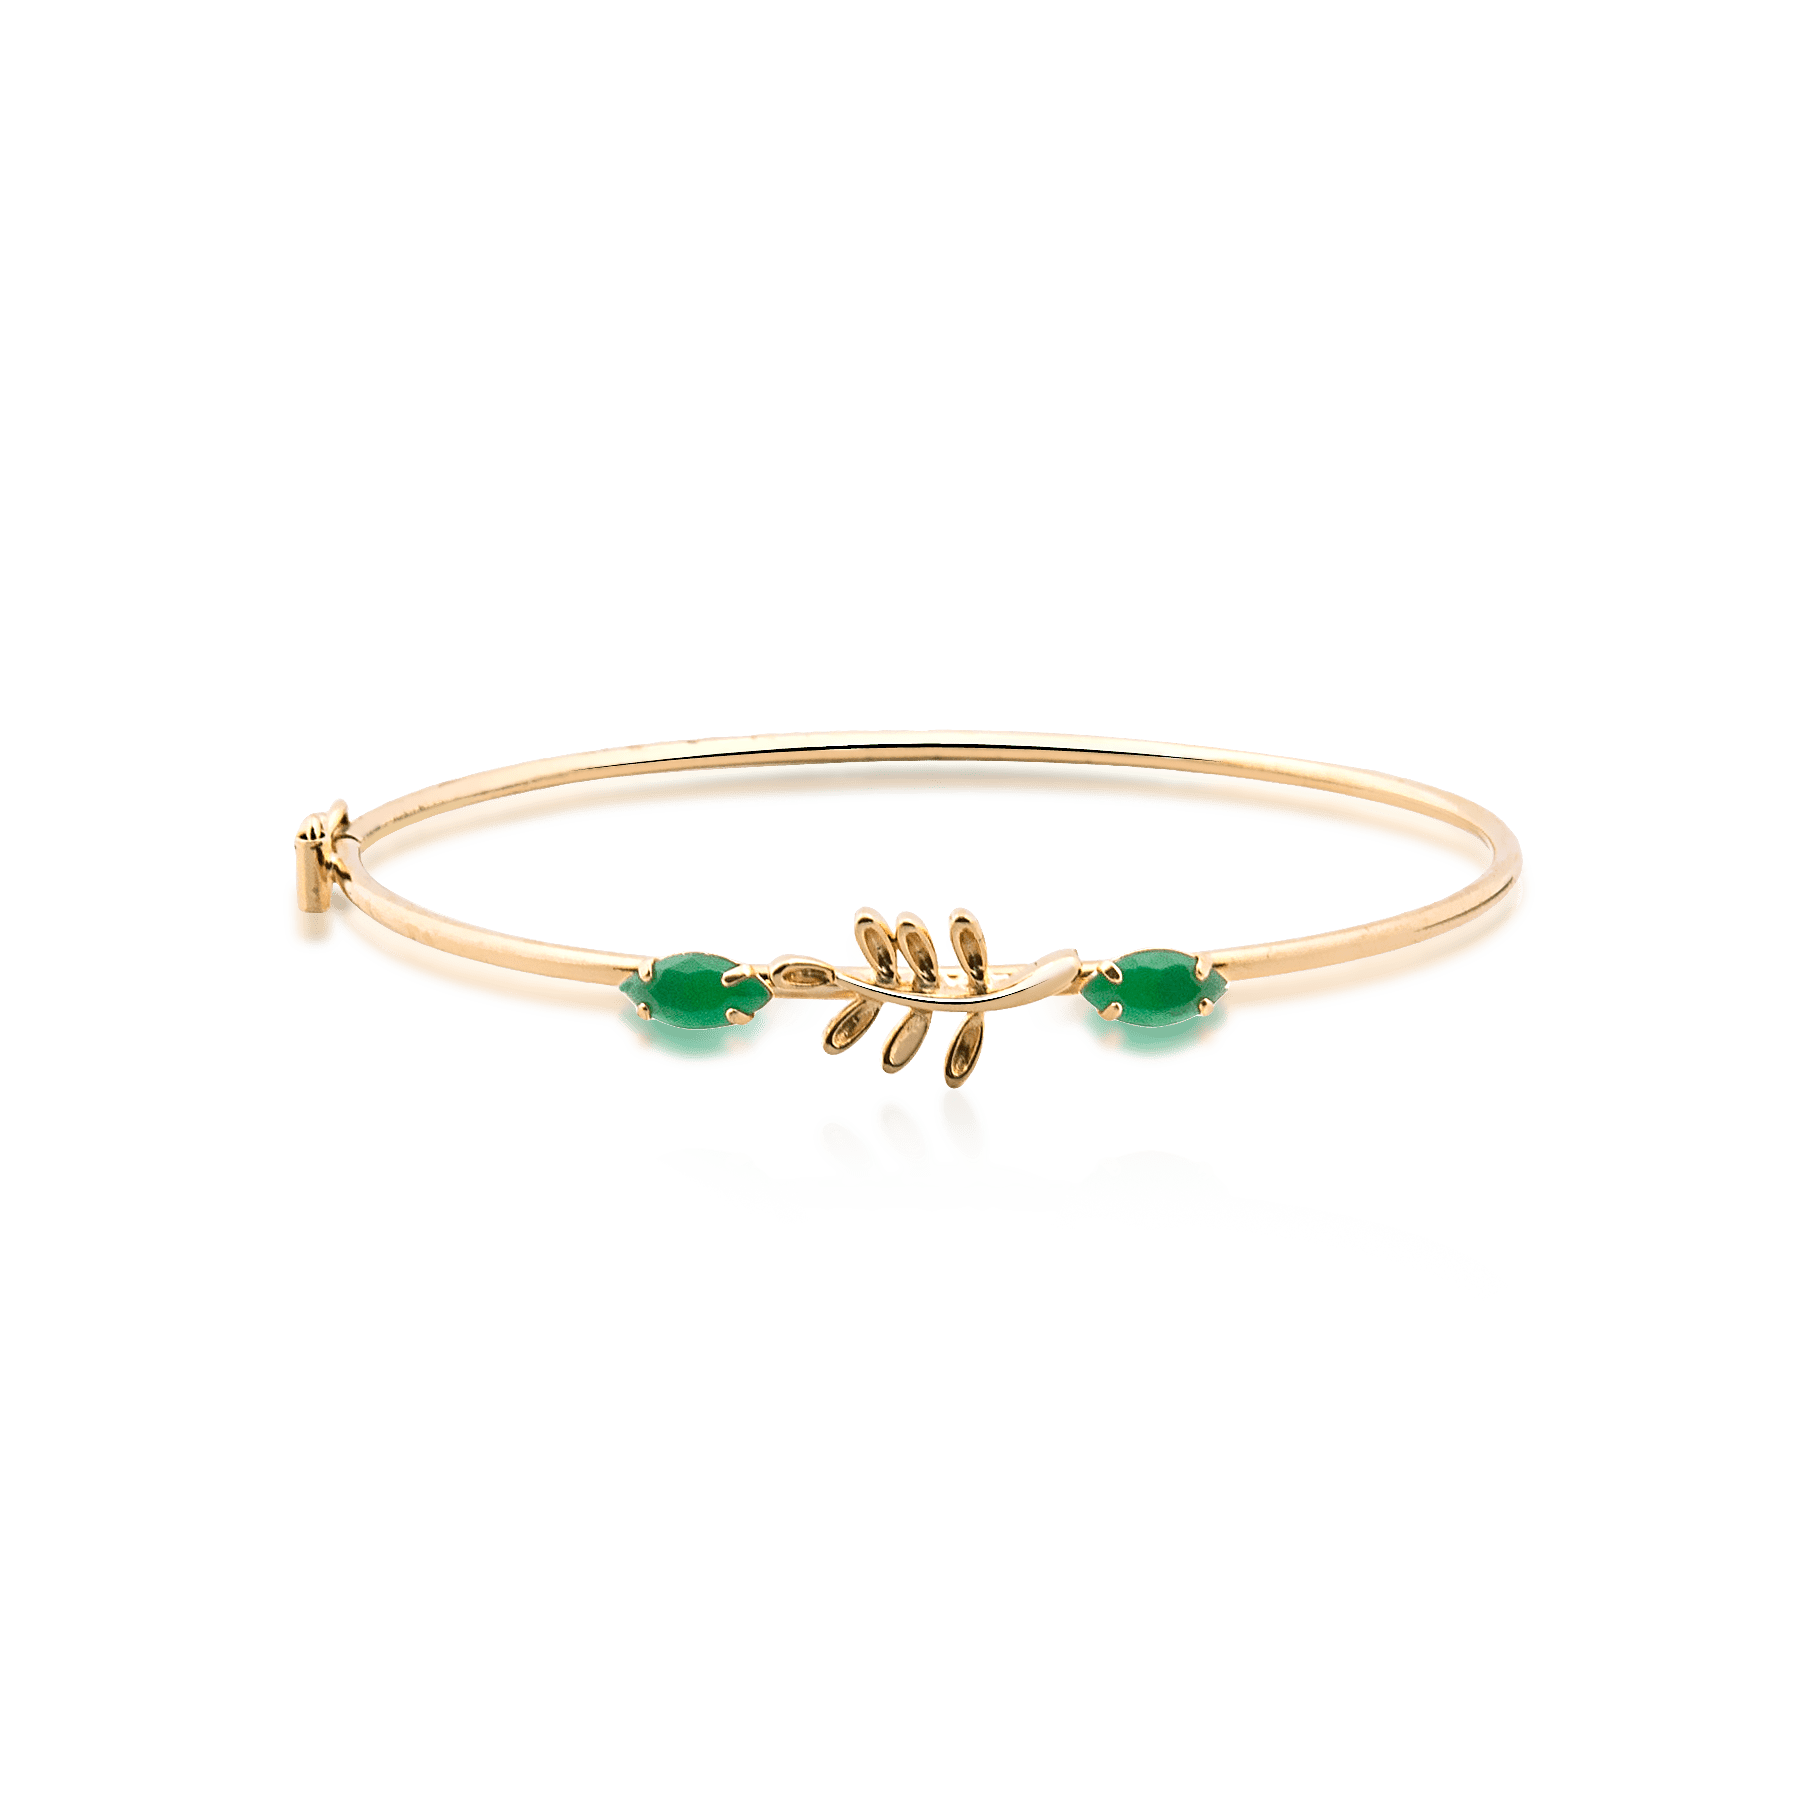 Bracelete Folheado Arruda Com Pedra - Natureza